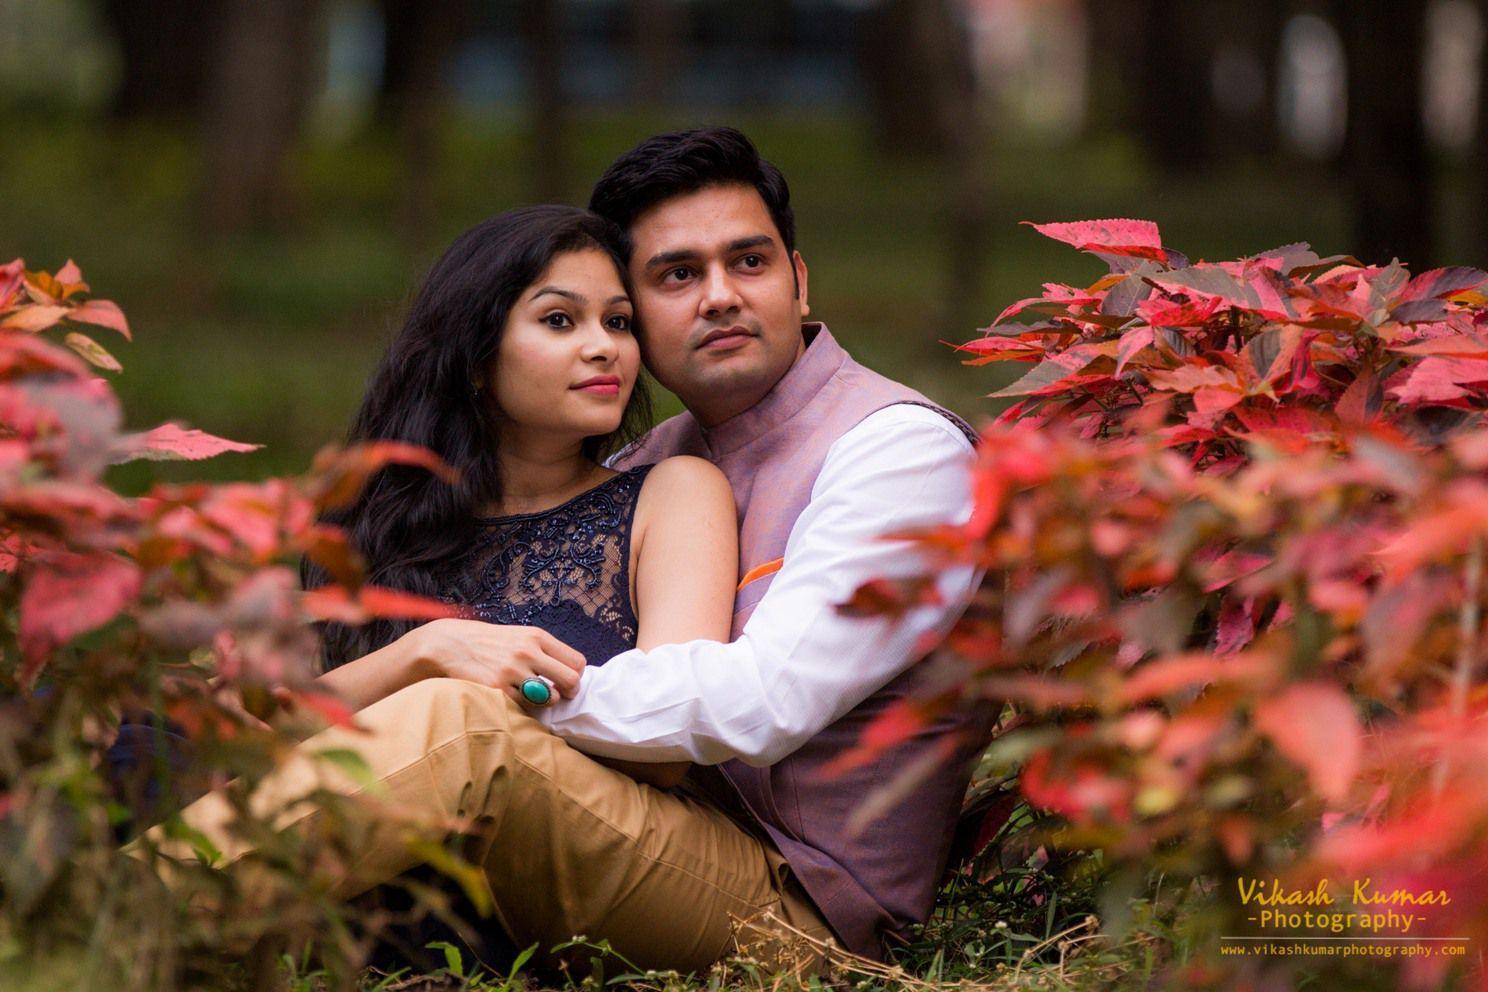 Indian Pre Wedding Photo shoot Ideas 2015 Latest Fashion